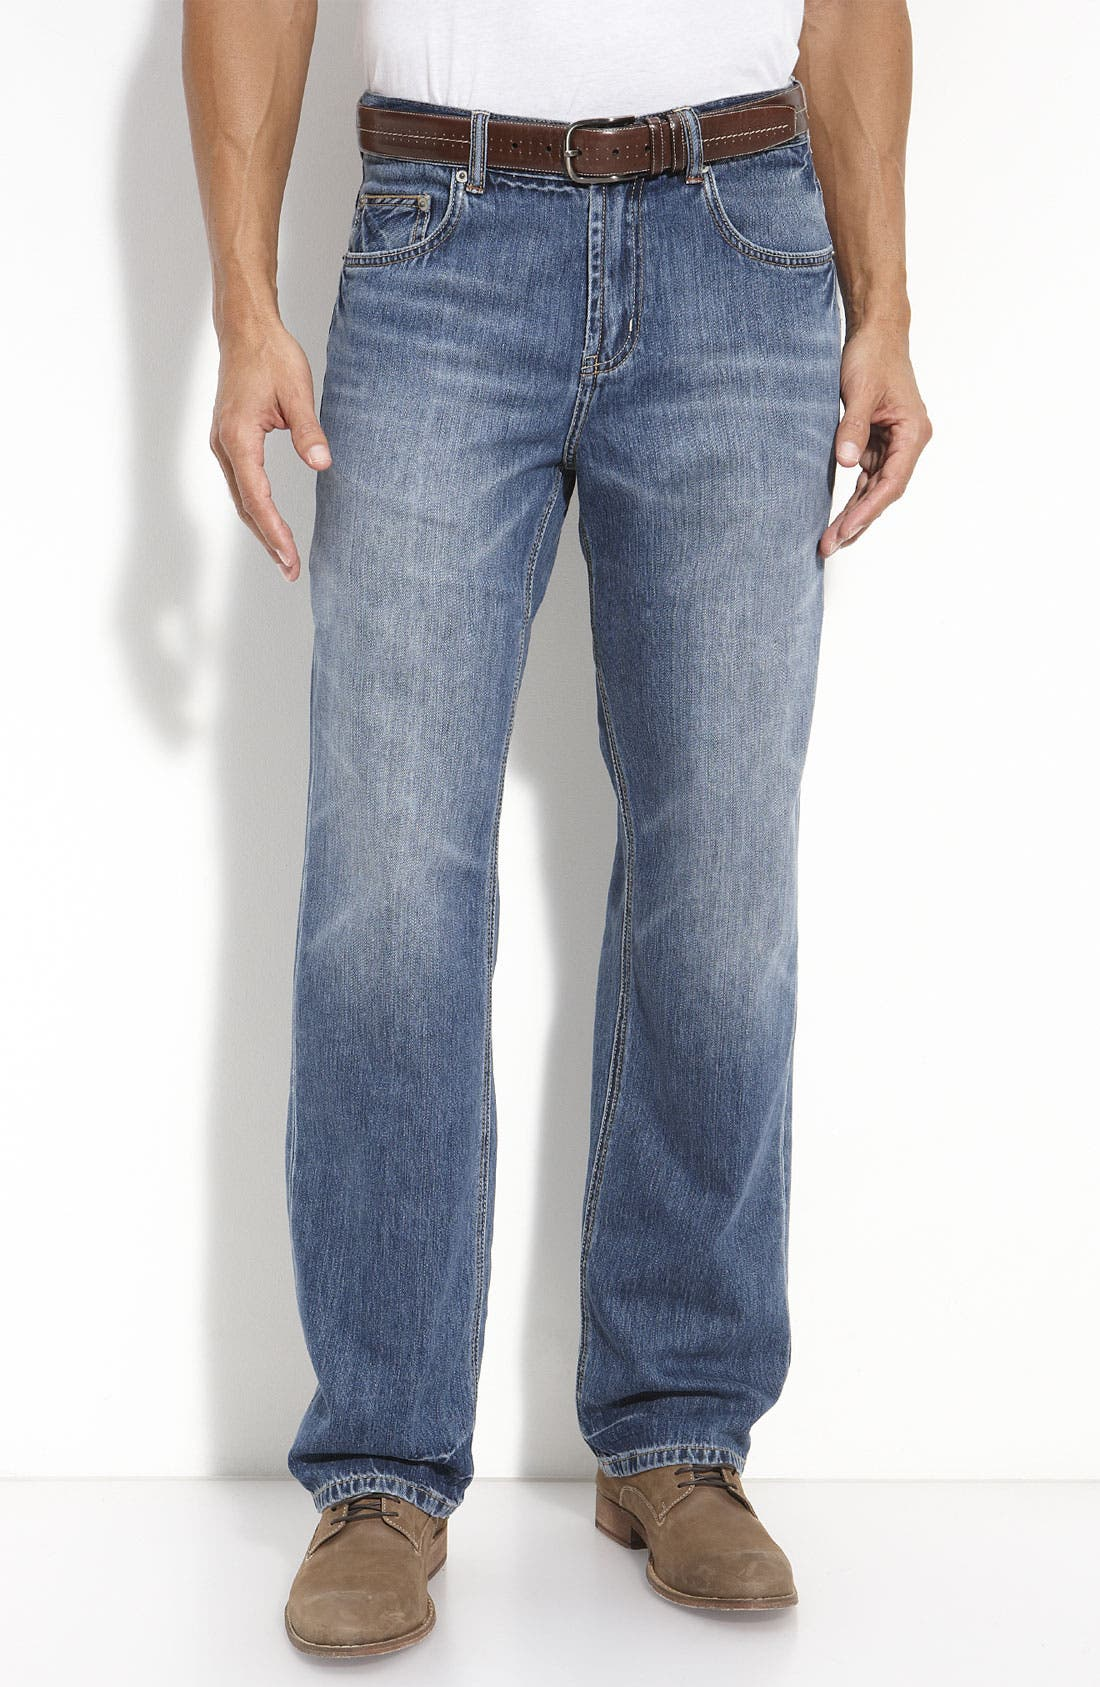 Alternate Image 1 Selected - Tommy Bahama Denim 'Island Ease' Classic Fit Jeans (Vintage Medium)(Big & Tall)